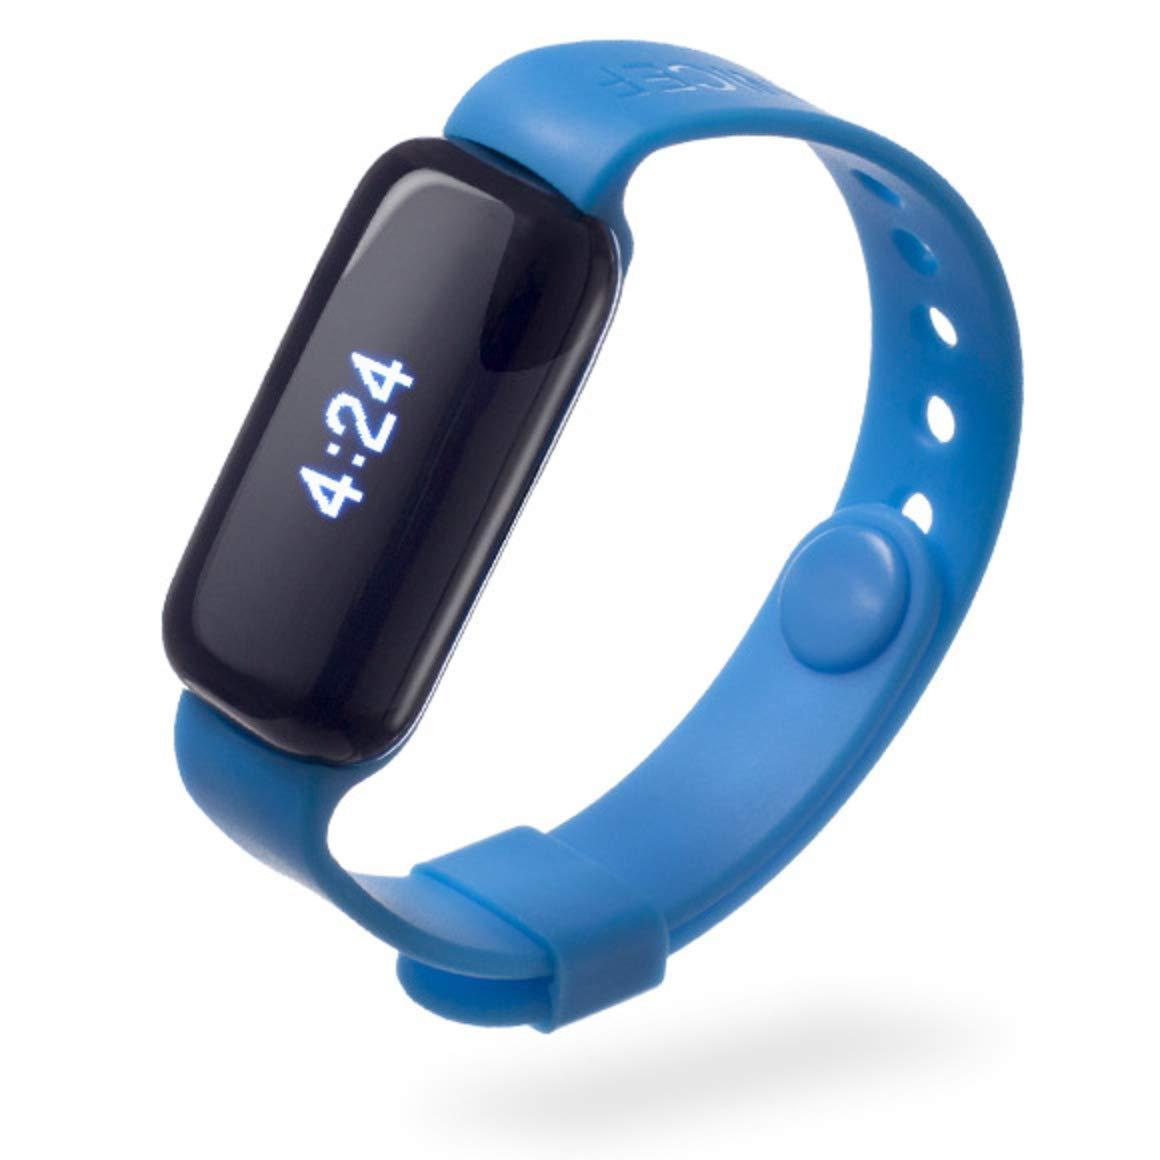 UNICEF Kid Power Band - Blue - Original Version - Kids Activity Tracker